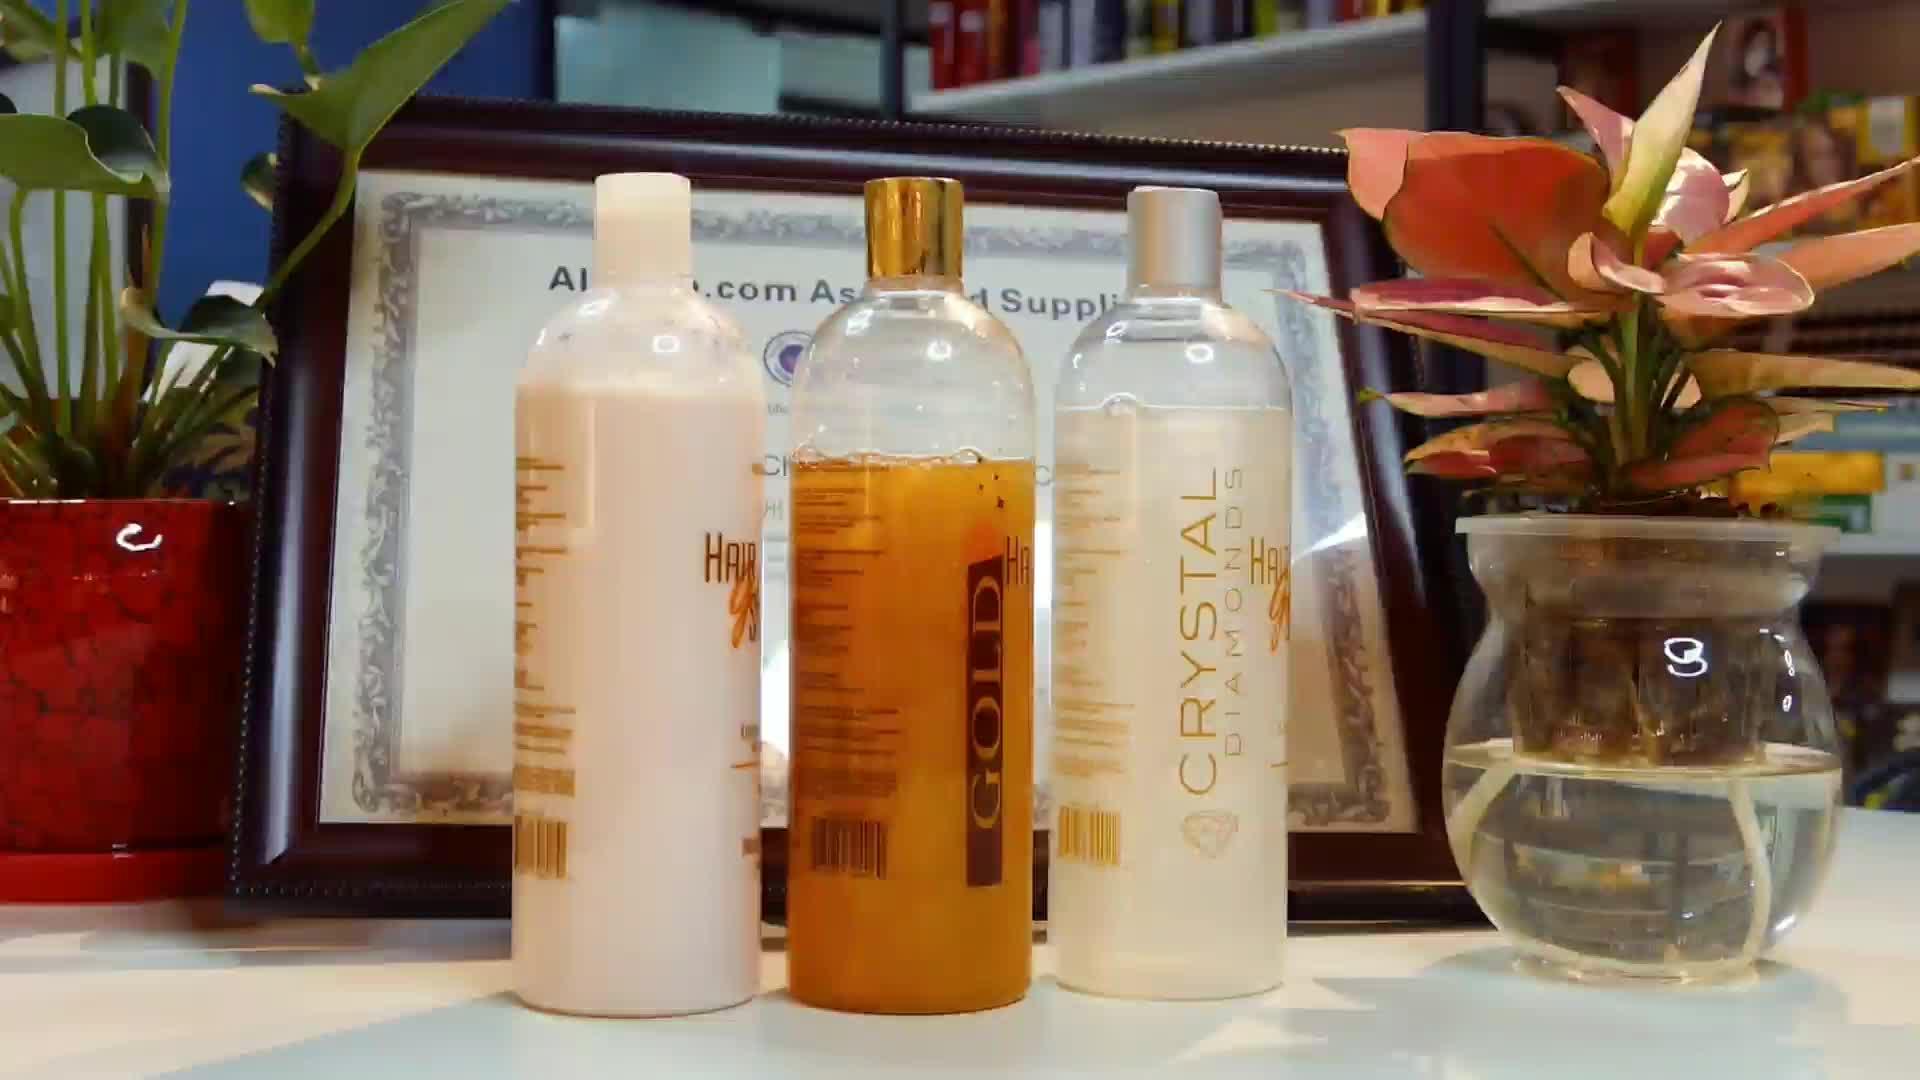 OEM/ODM Factory price moroccan oil hair straightening treatment keratin hair cream